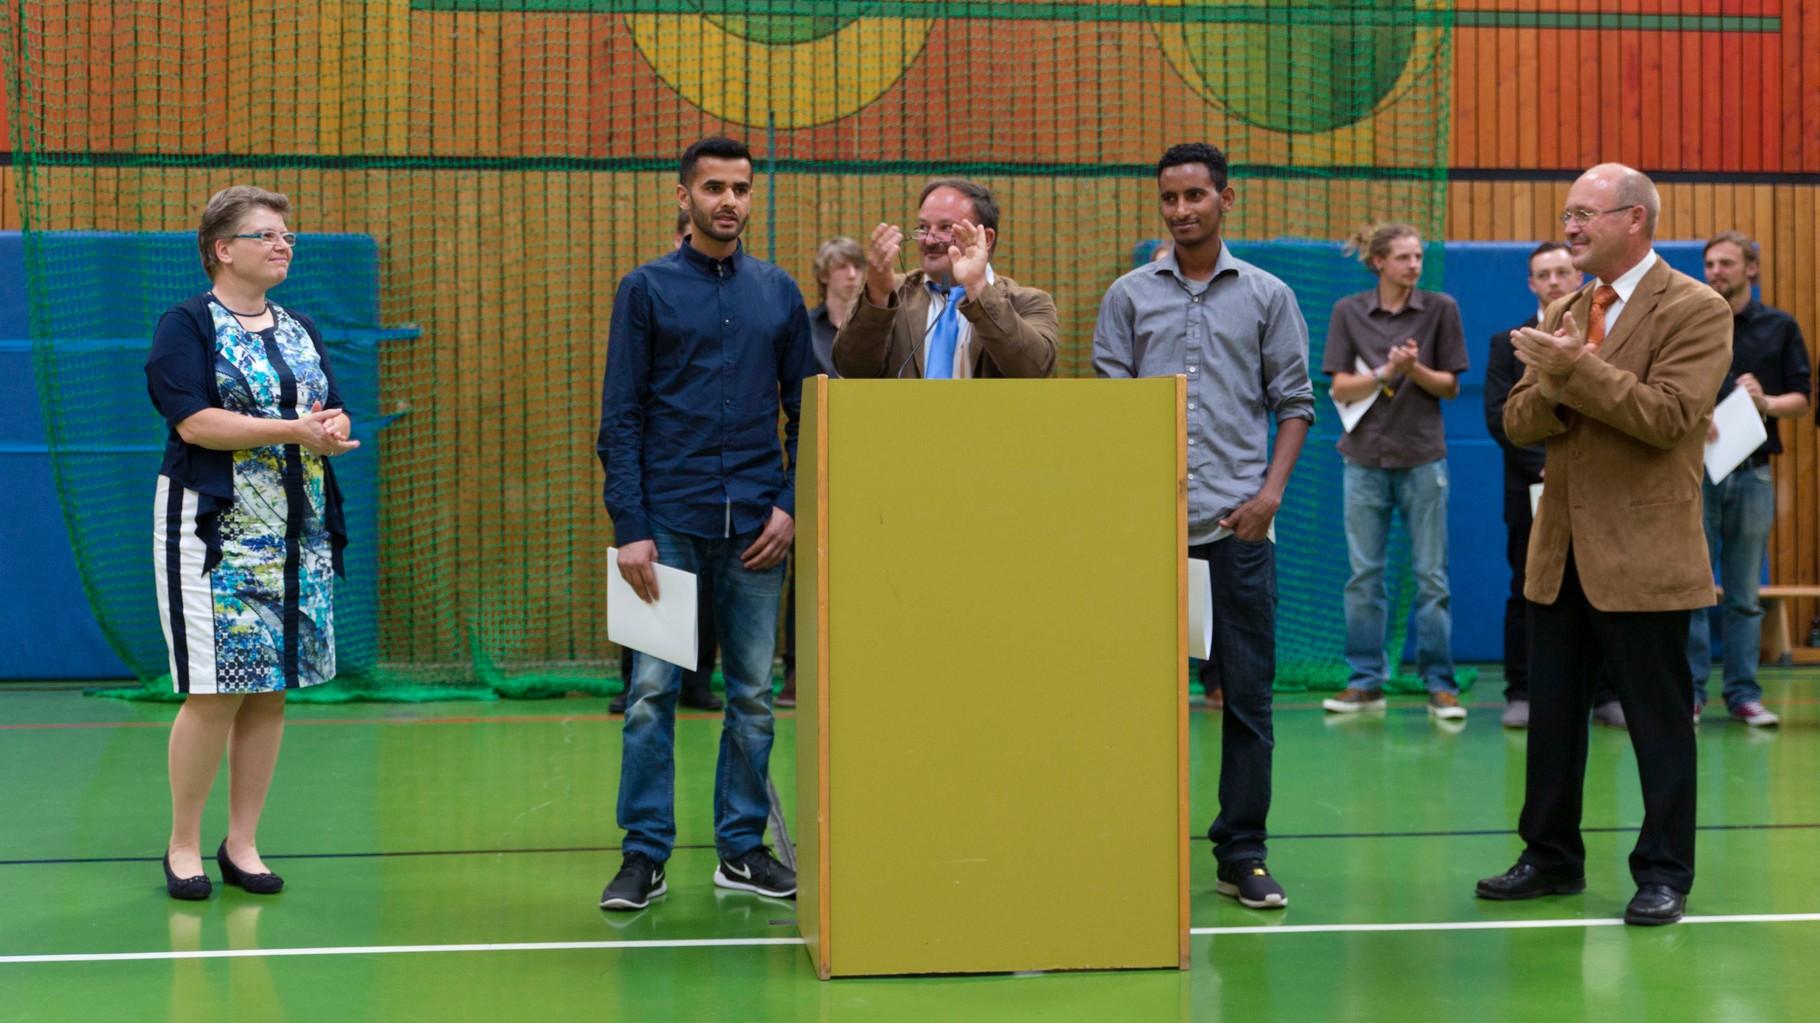 Fr. Tschakert, Hr. Crößmann, Hr. Sehl & Elektrotechnikschüler